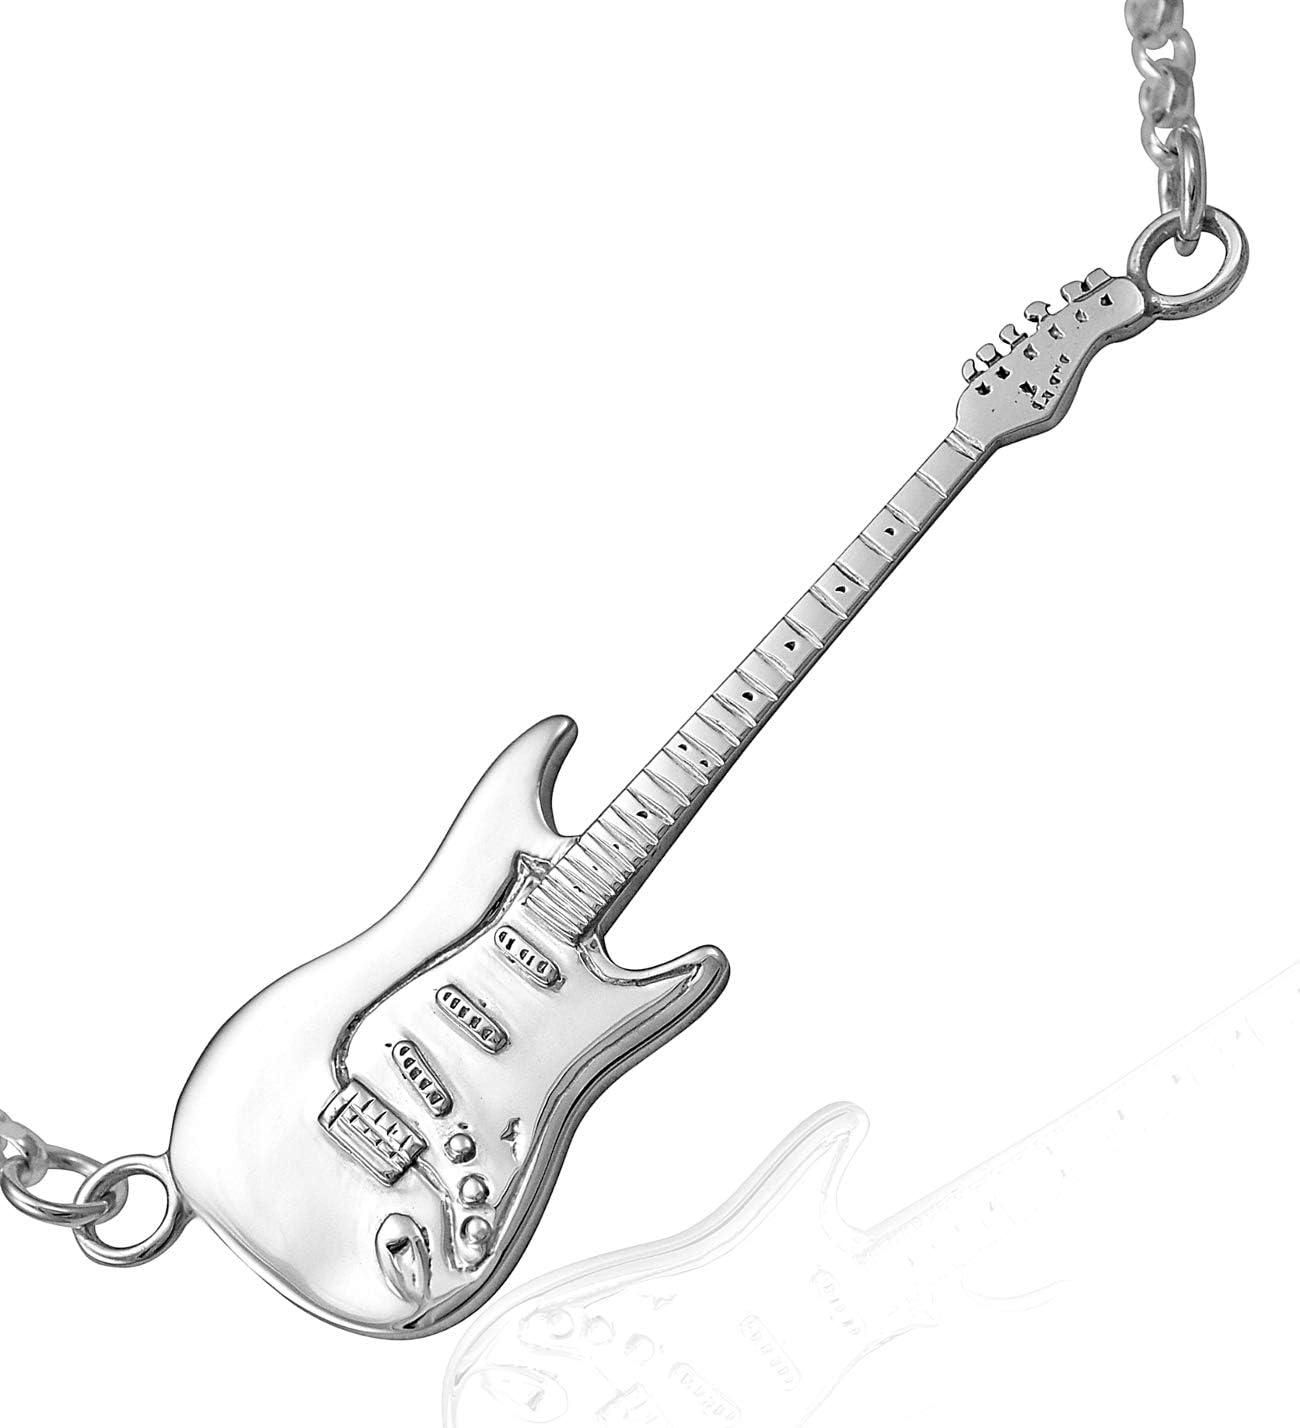 Unisex sólido plata de ley Fender Stratocaster Guitarra eléctrica ...